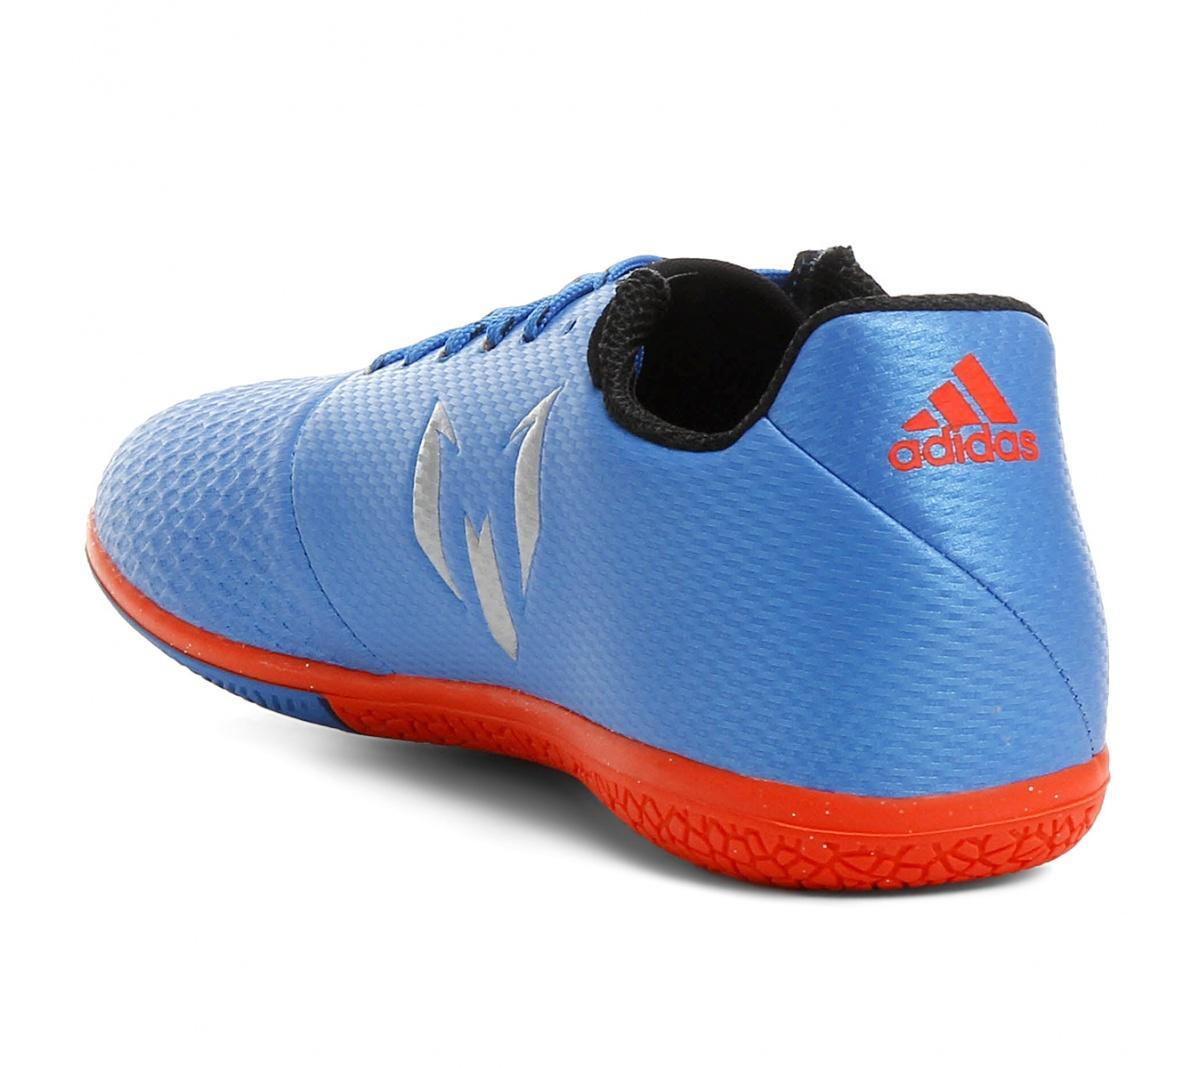 Tênis Adidas Messi 16.3 Futsal Infantil Az - Mundo do Futebol 674851cfa2867